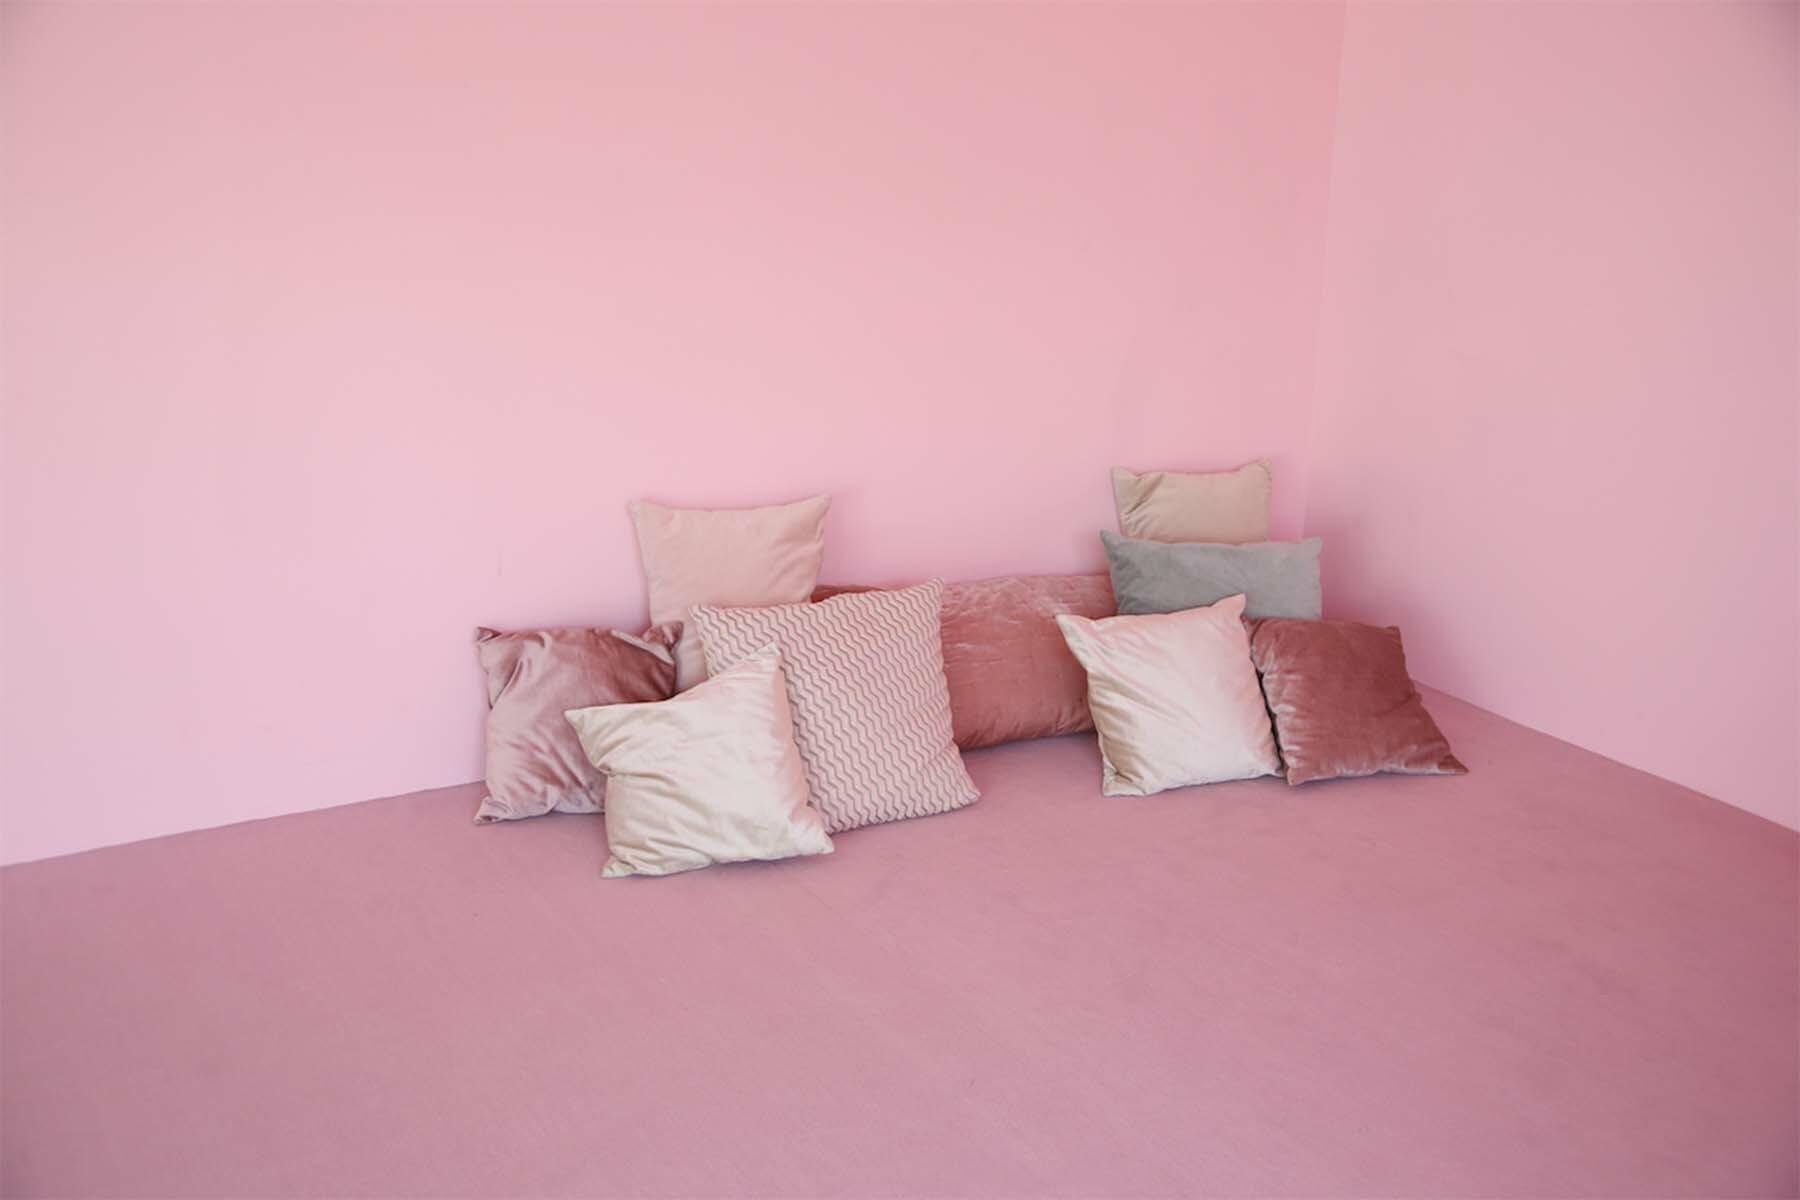 PANSY STUDIO(パンジースタジオ)ダストボックス